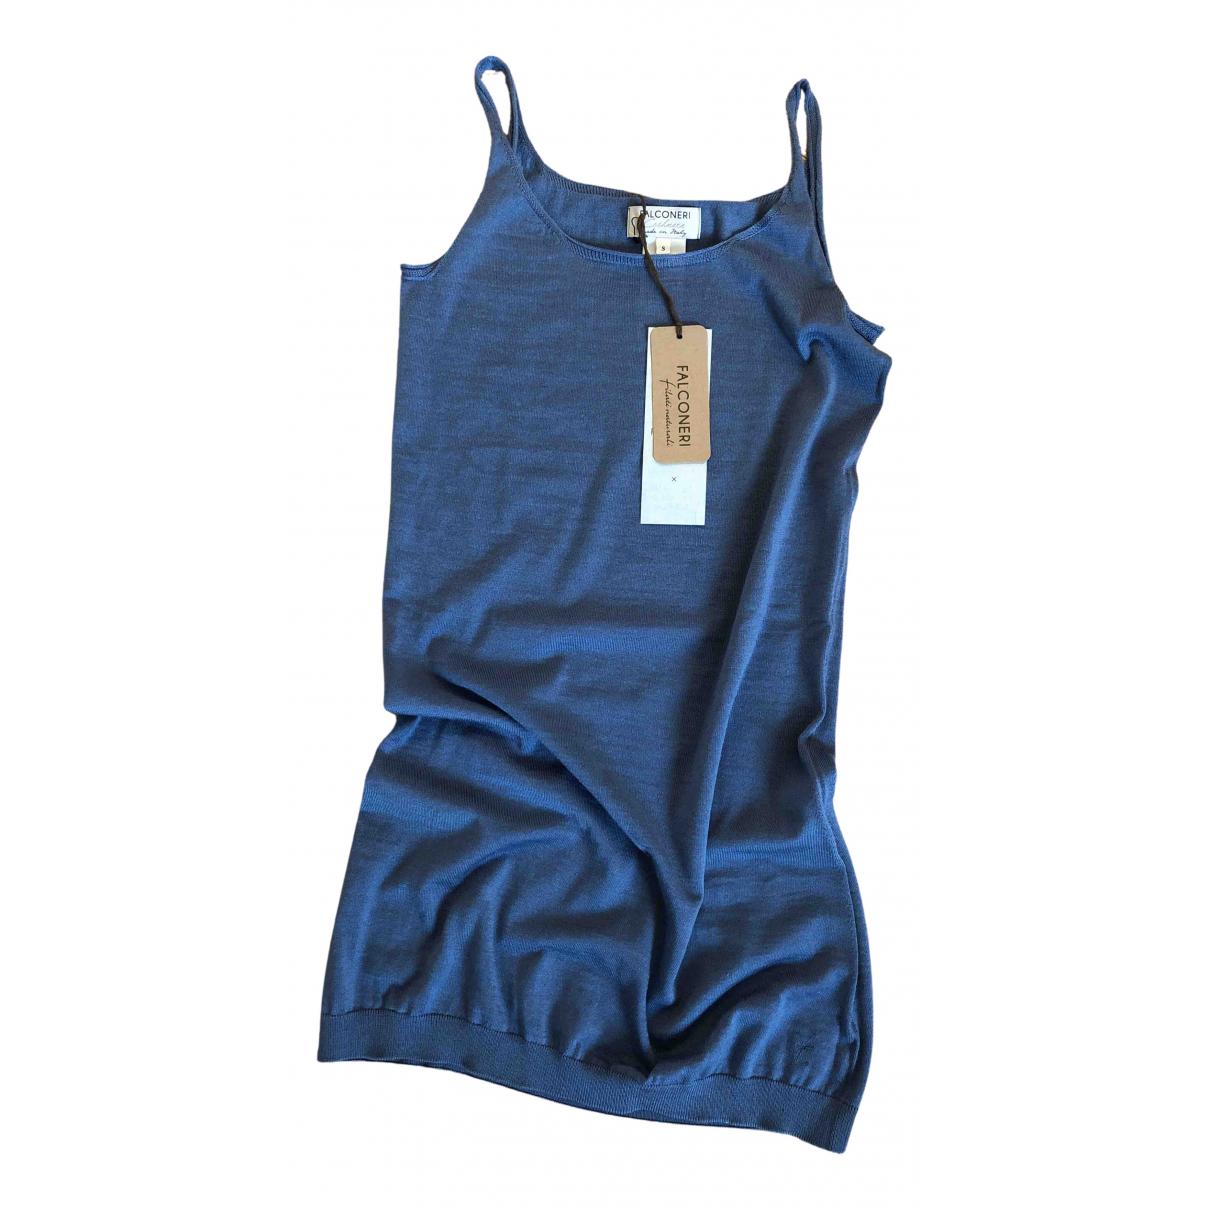 Falconeri N Blue Cashmere Knitwear for Women S International